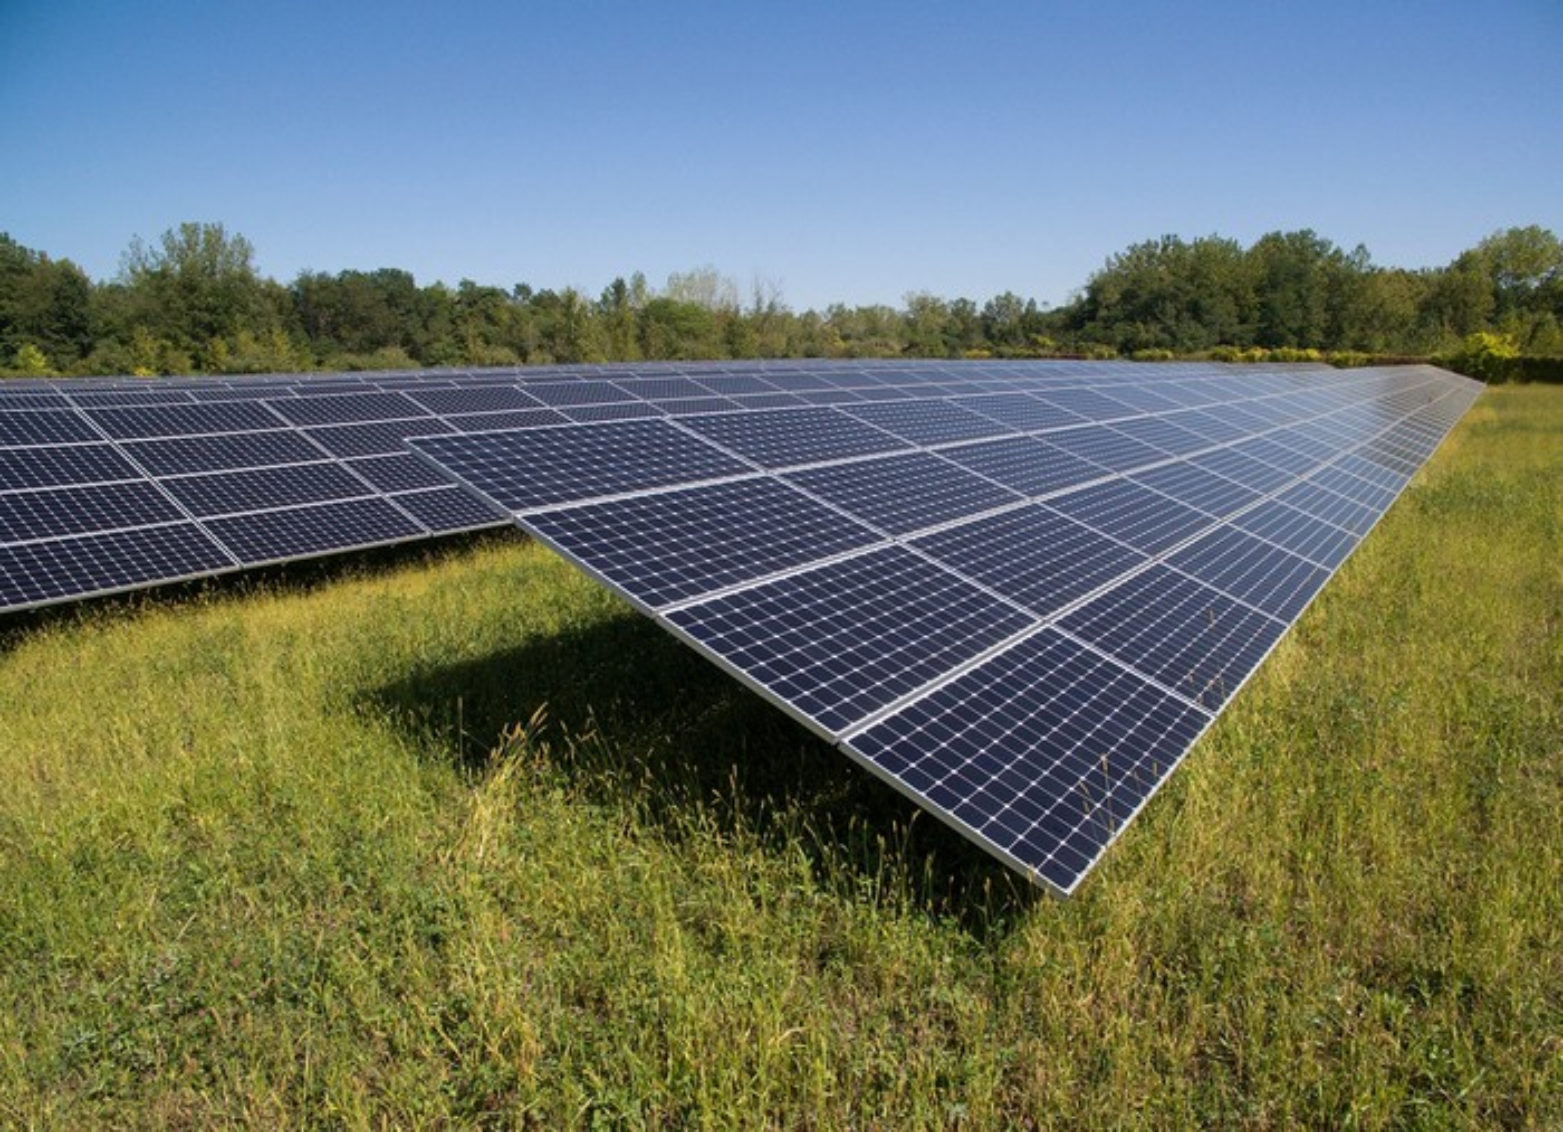 Solar power plant in a grassy field.